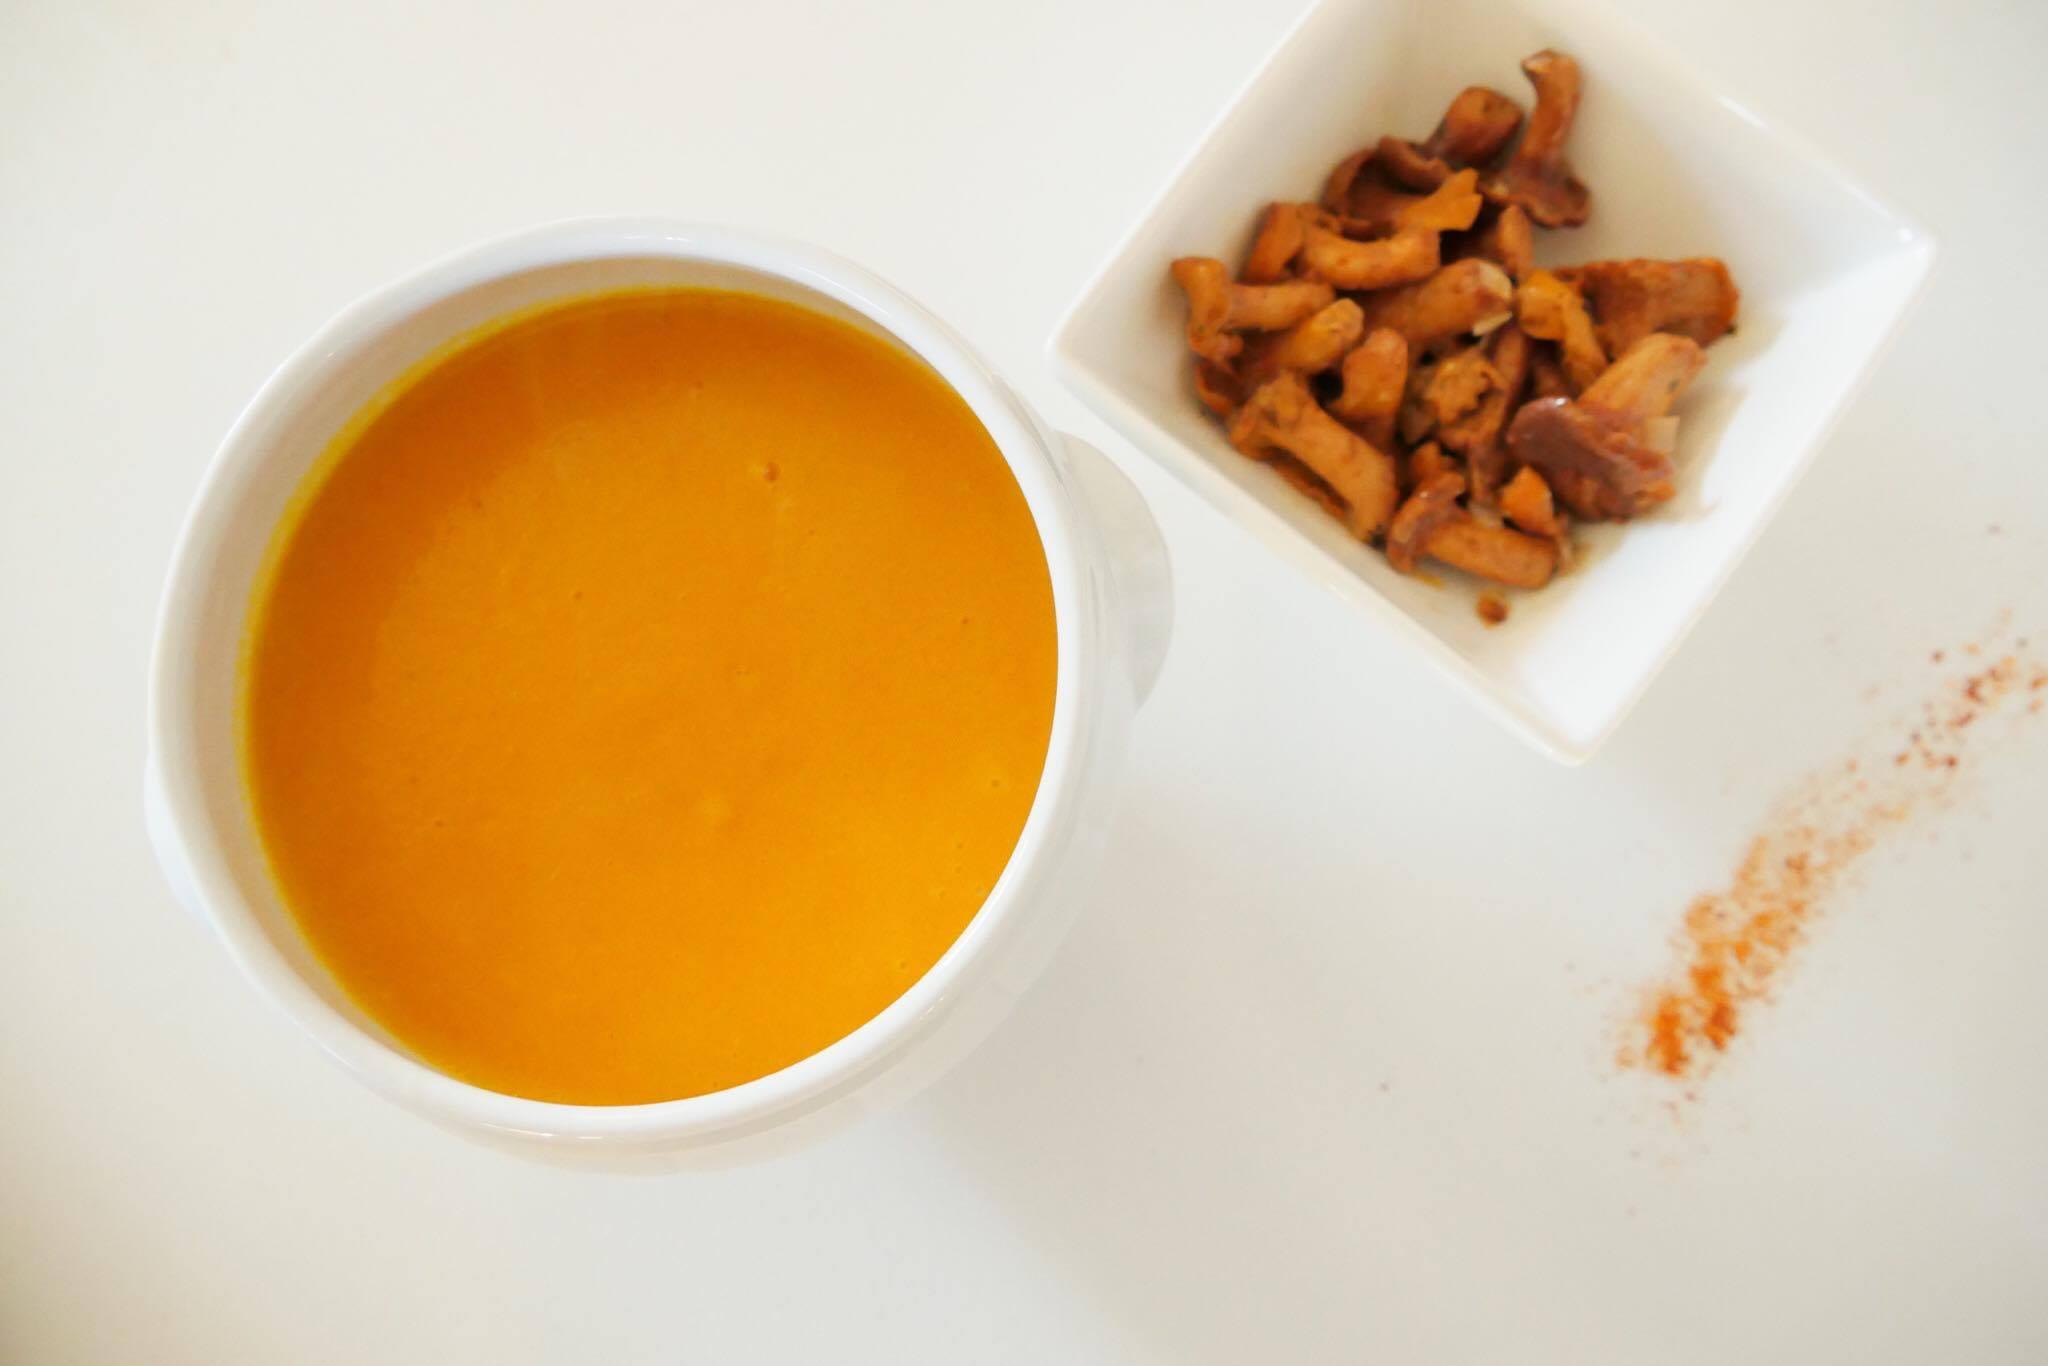 soupe potimarron vegan automne noisette girolles Biarritz